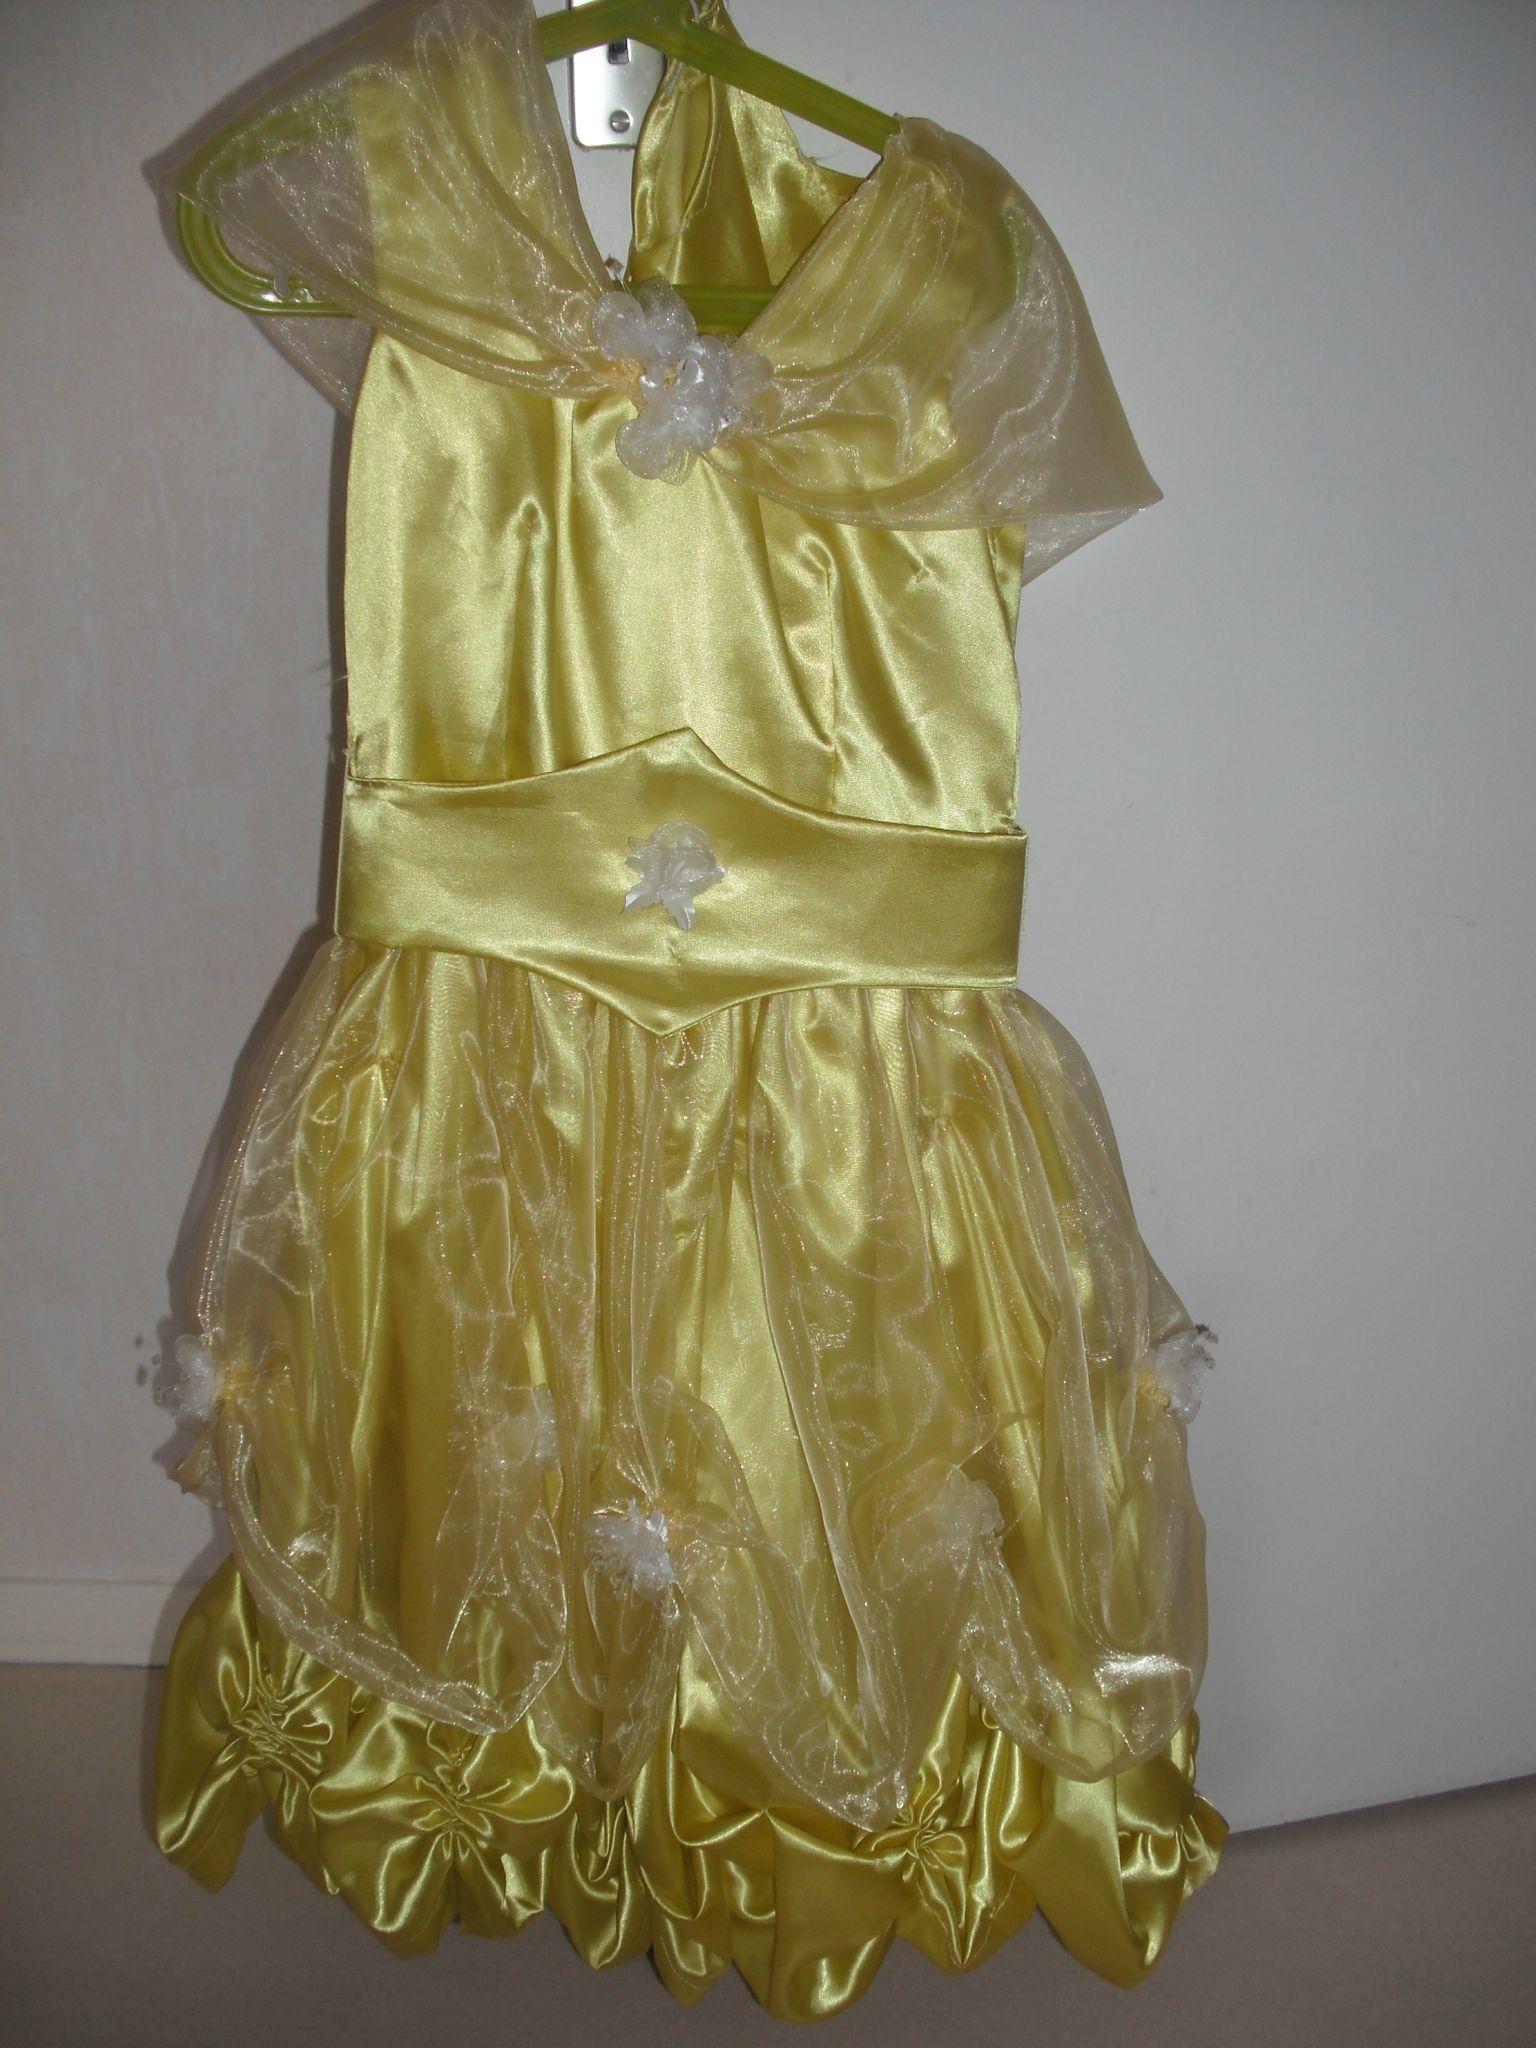 Robe Belle et la Belle 1